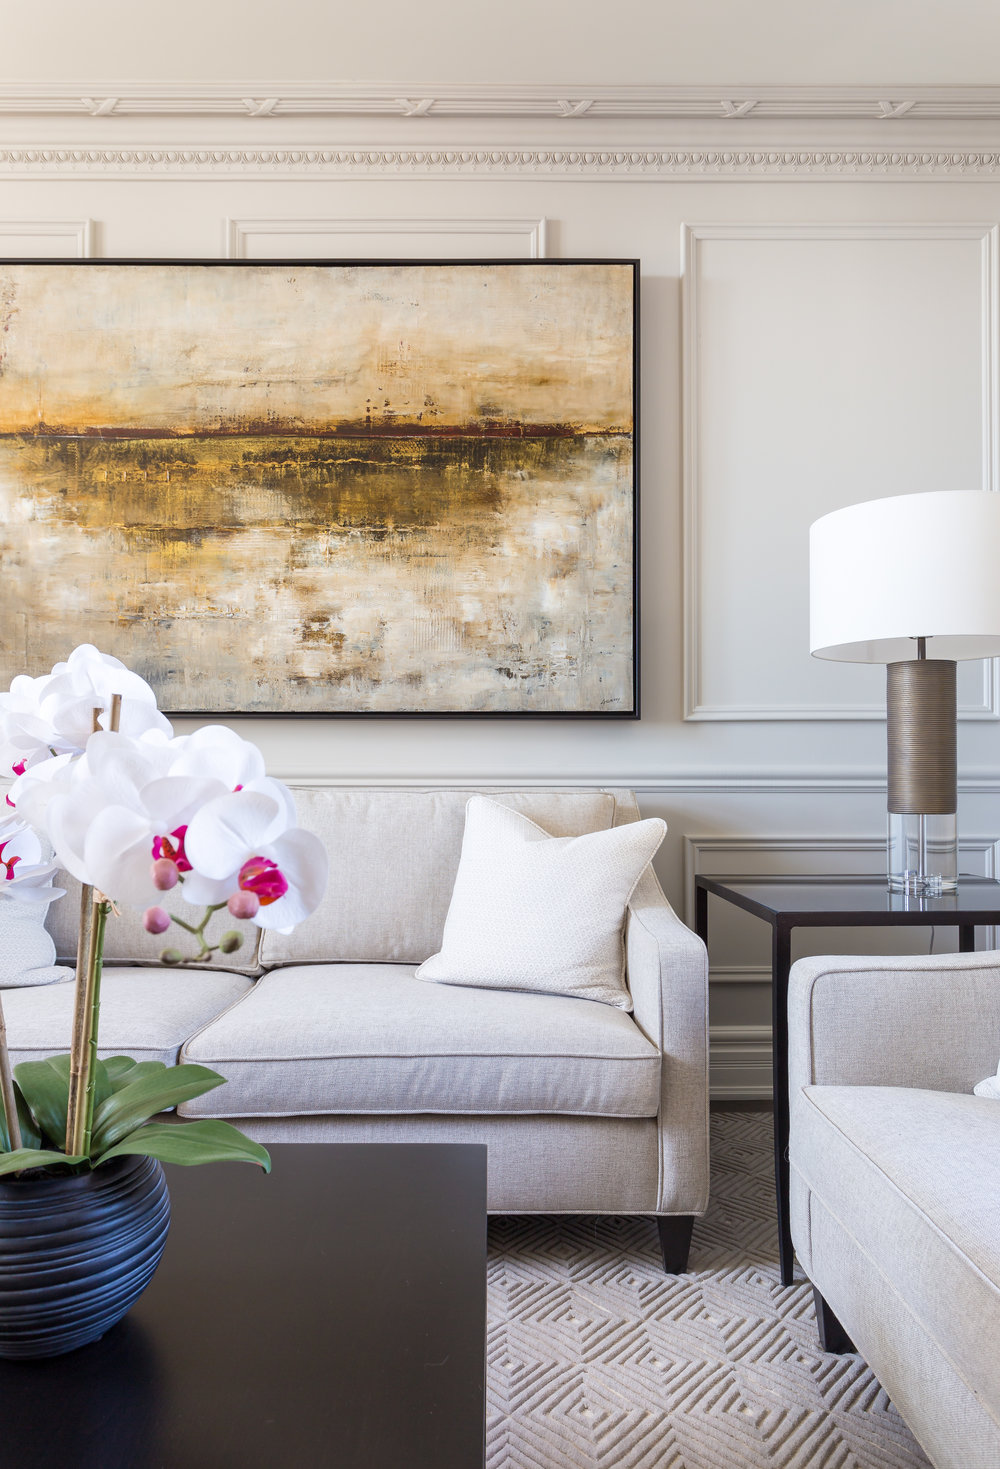 oakville-interior design-living room-furniture-robson hallford